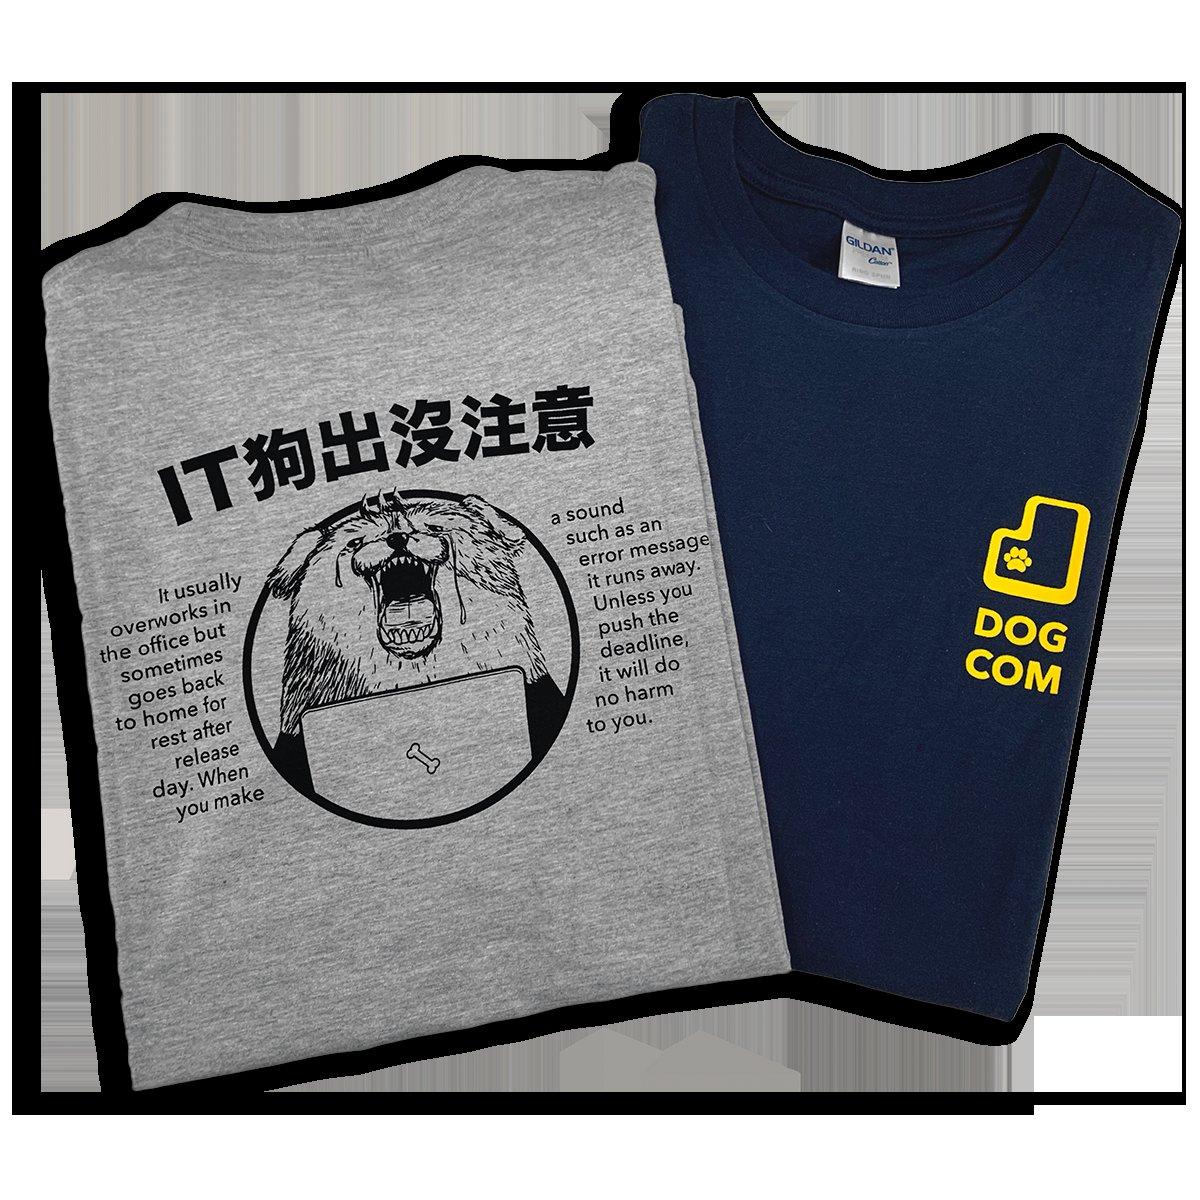 IT狗出沒注意(海軍藍)XL號-preview-7